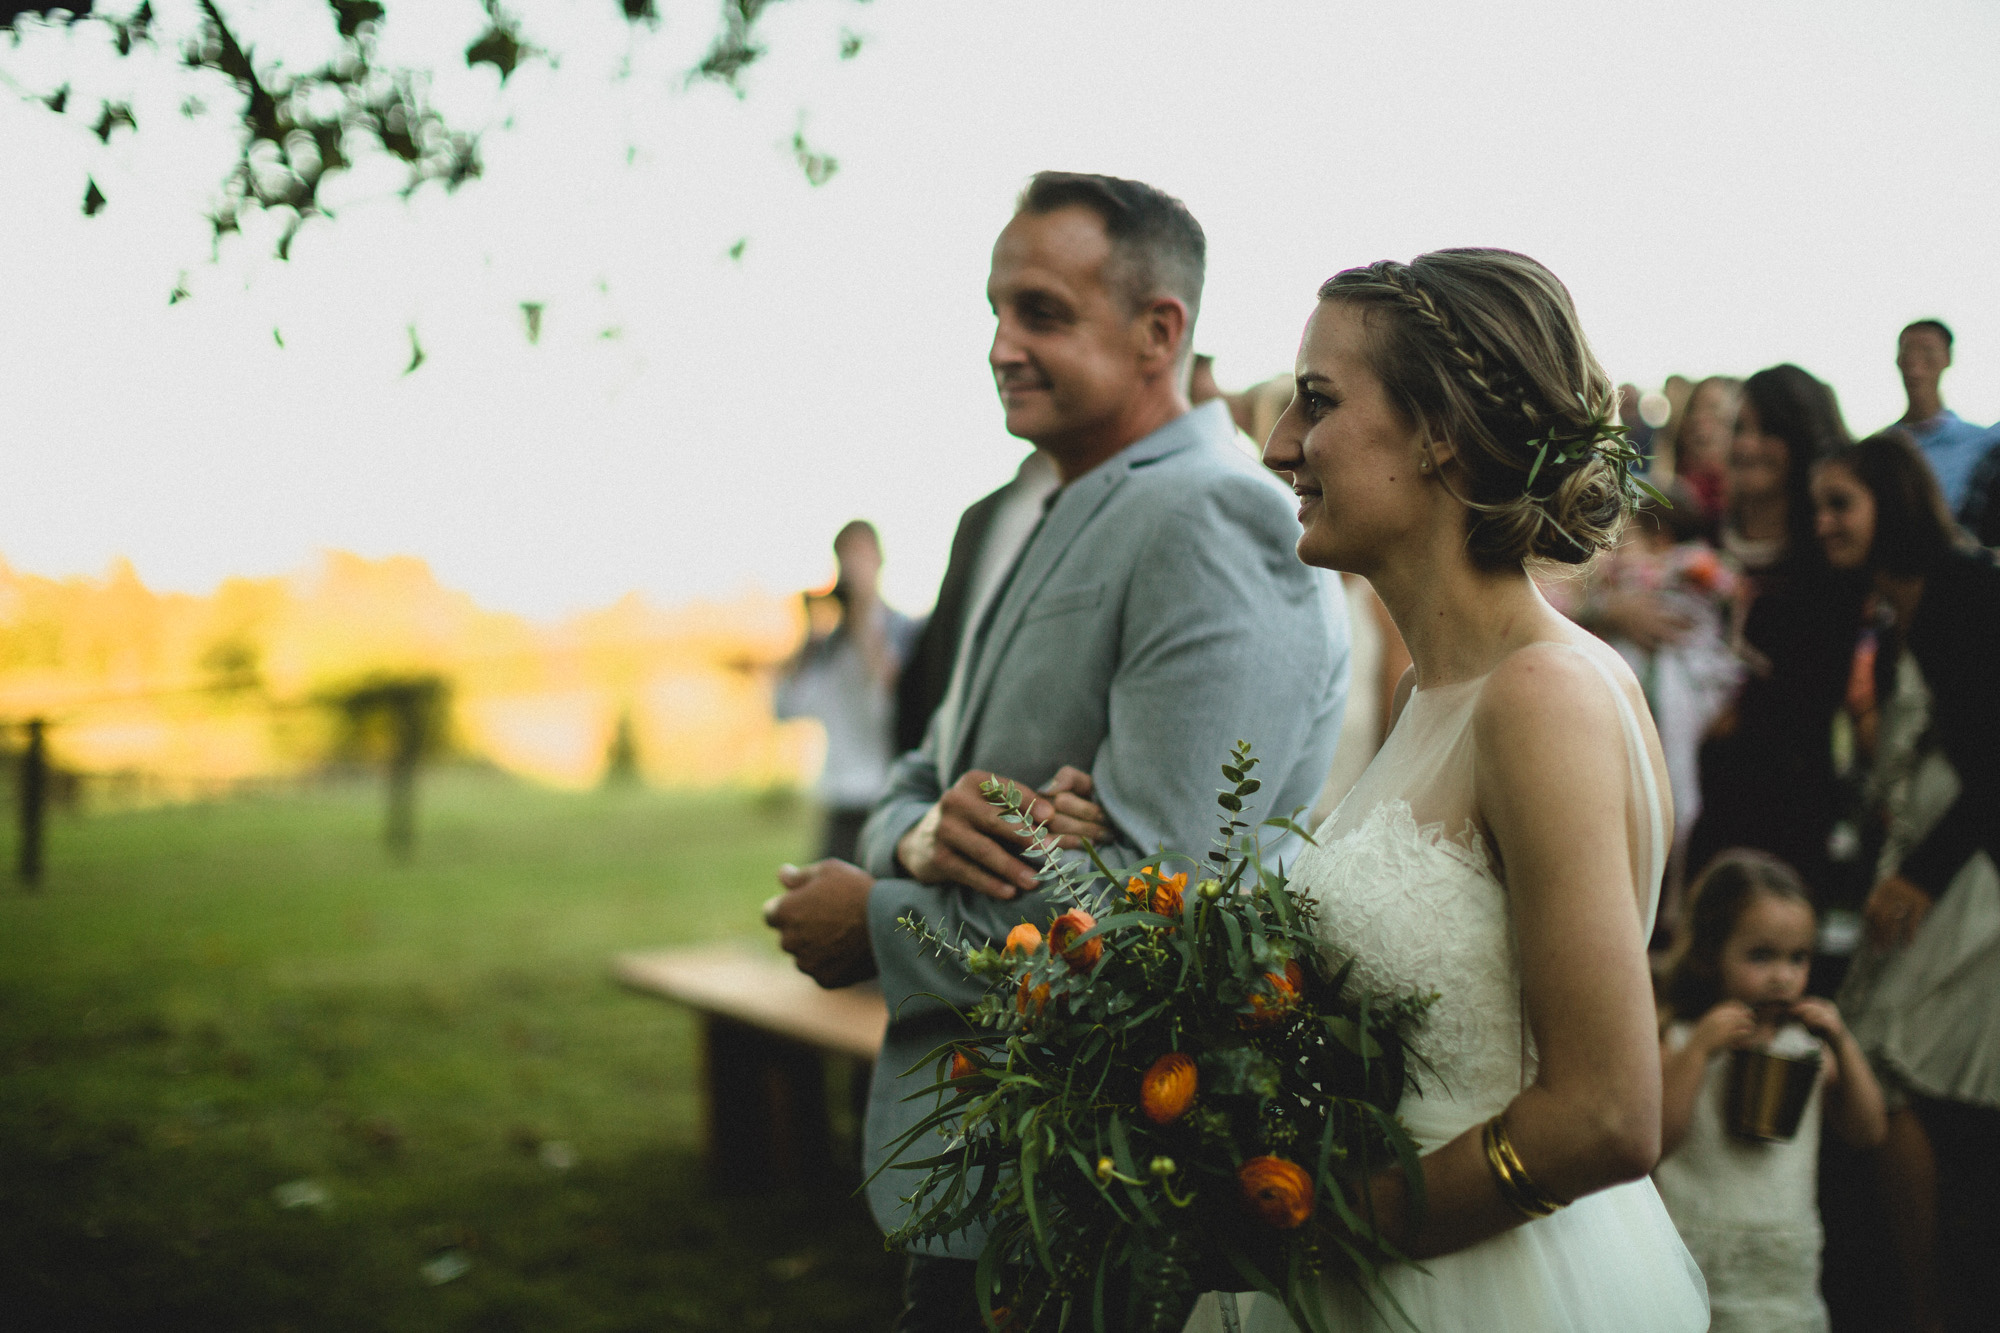 alec_vanderboom_springfield_missouri_wedding-0065.jpg